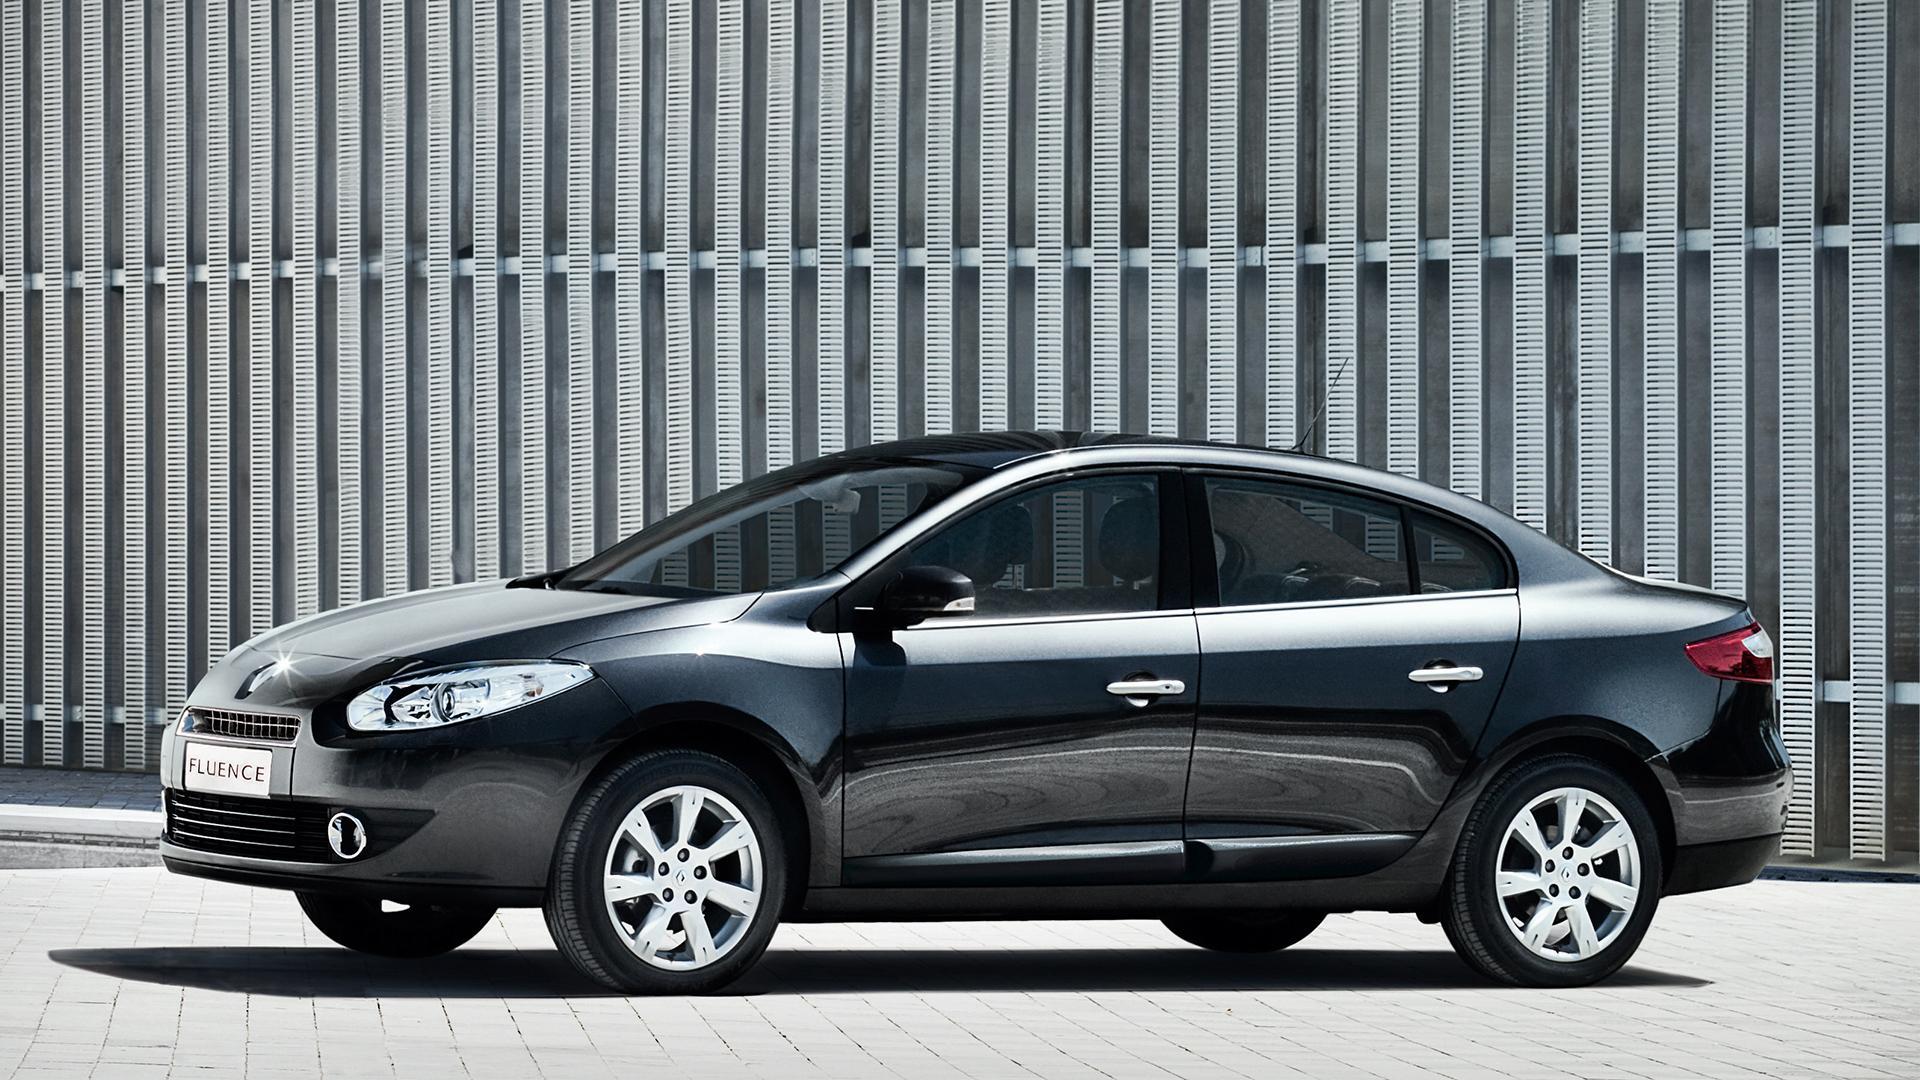 Novo-Renault-Fluence-2015-12